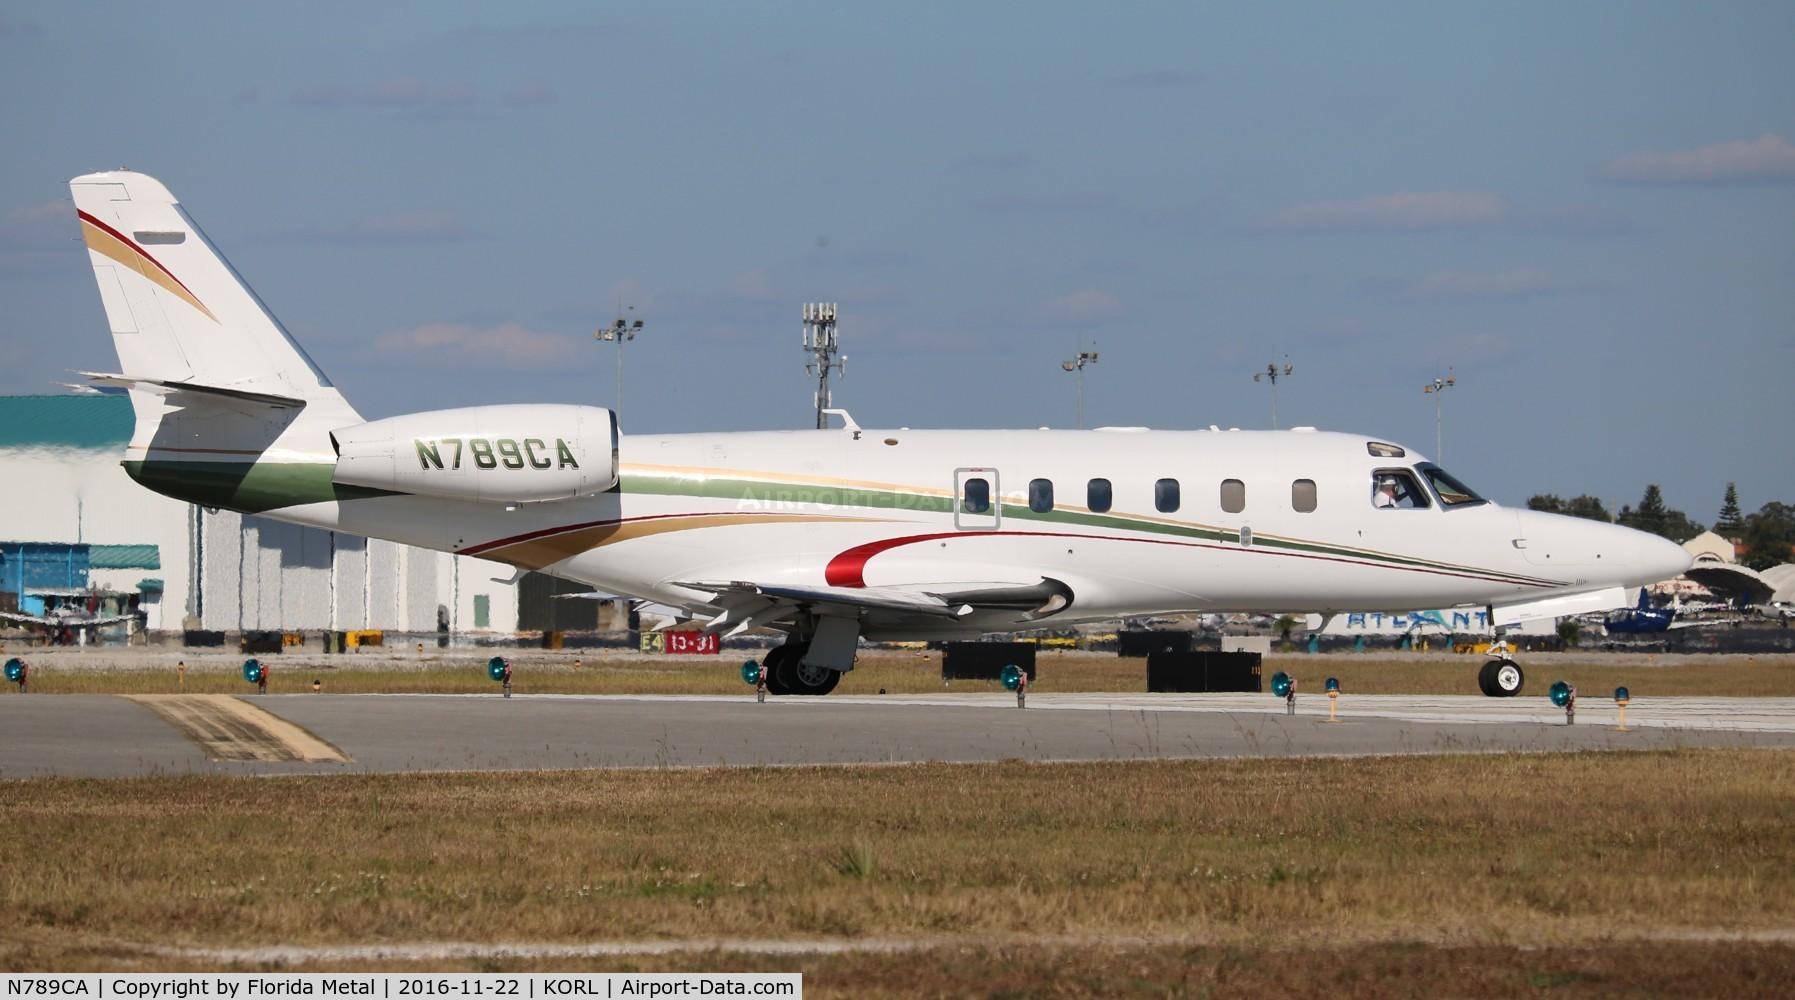 N789CA, 1994 Israel Aircraft Industries IAI-1125 Westwind Astra C/N 074, Astra